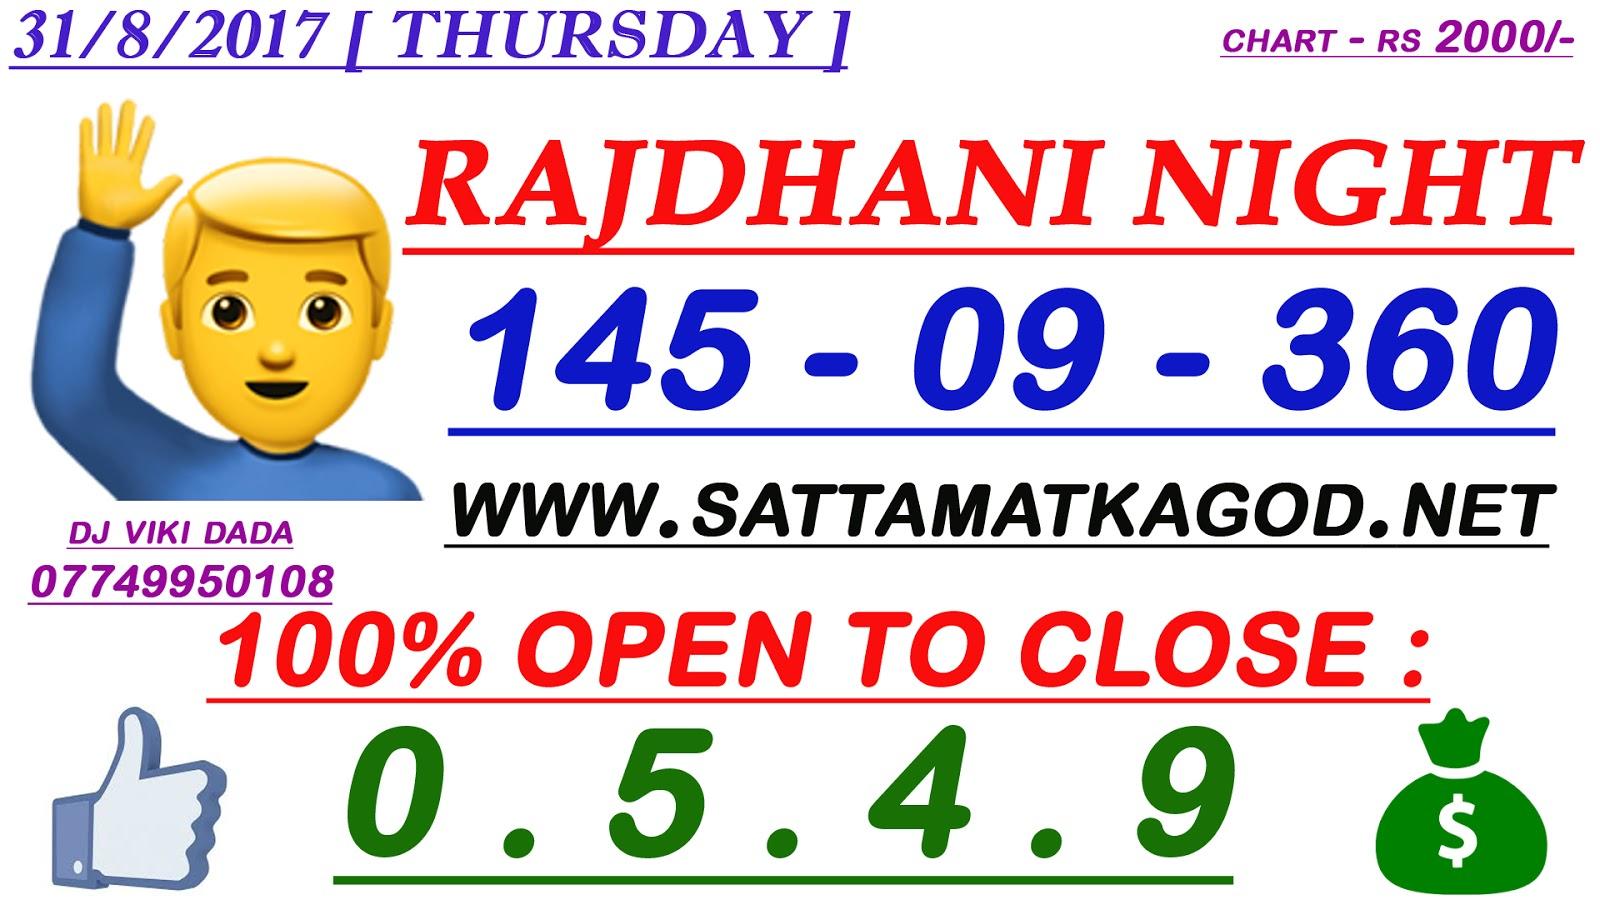 Rajdhani chart day